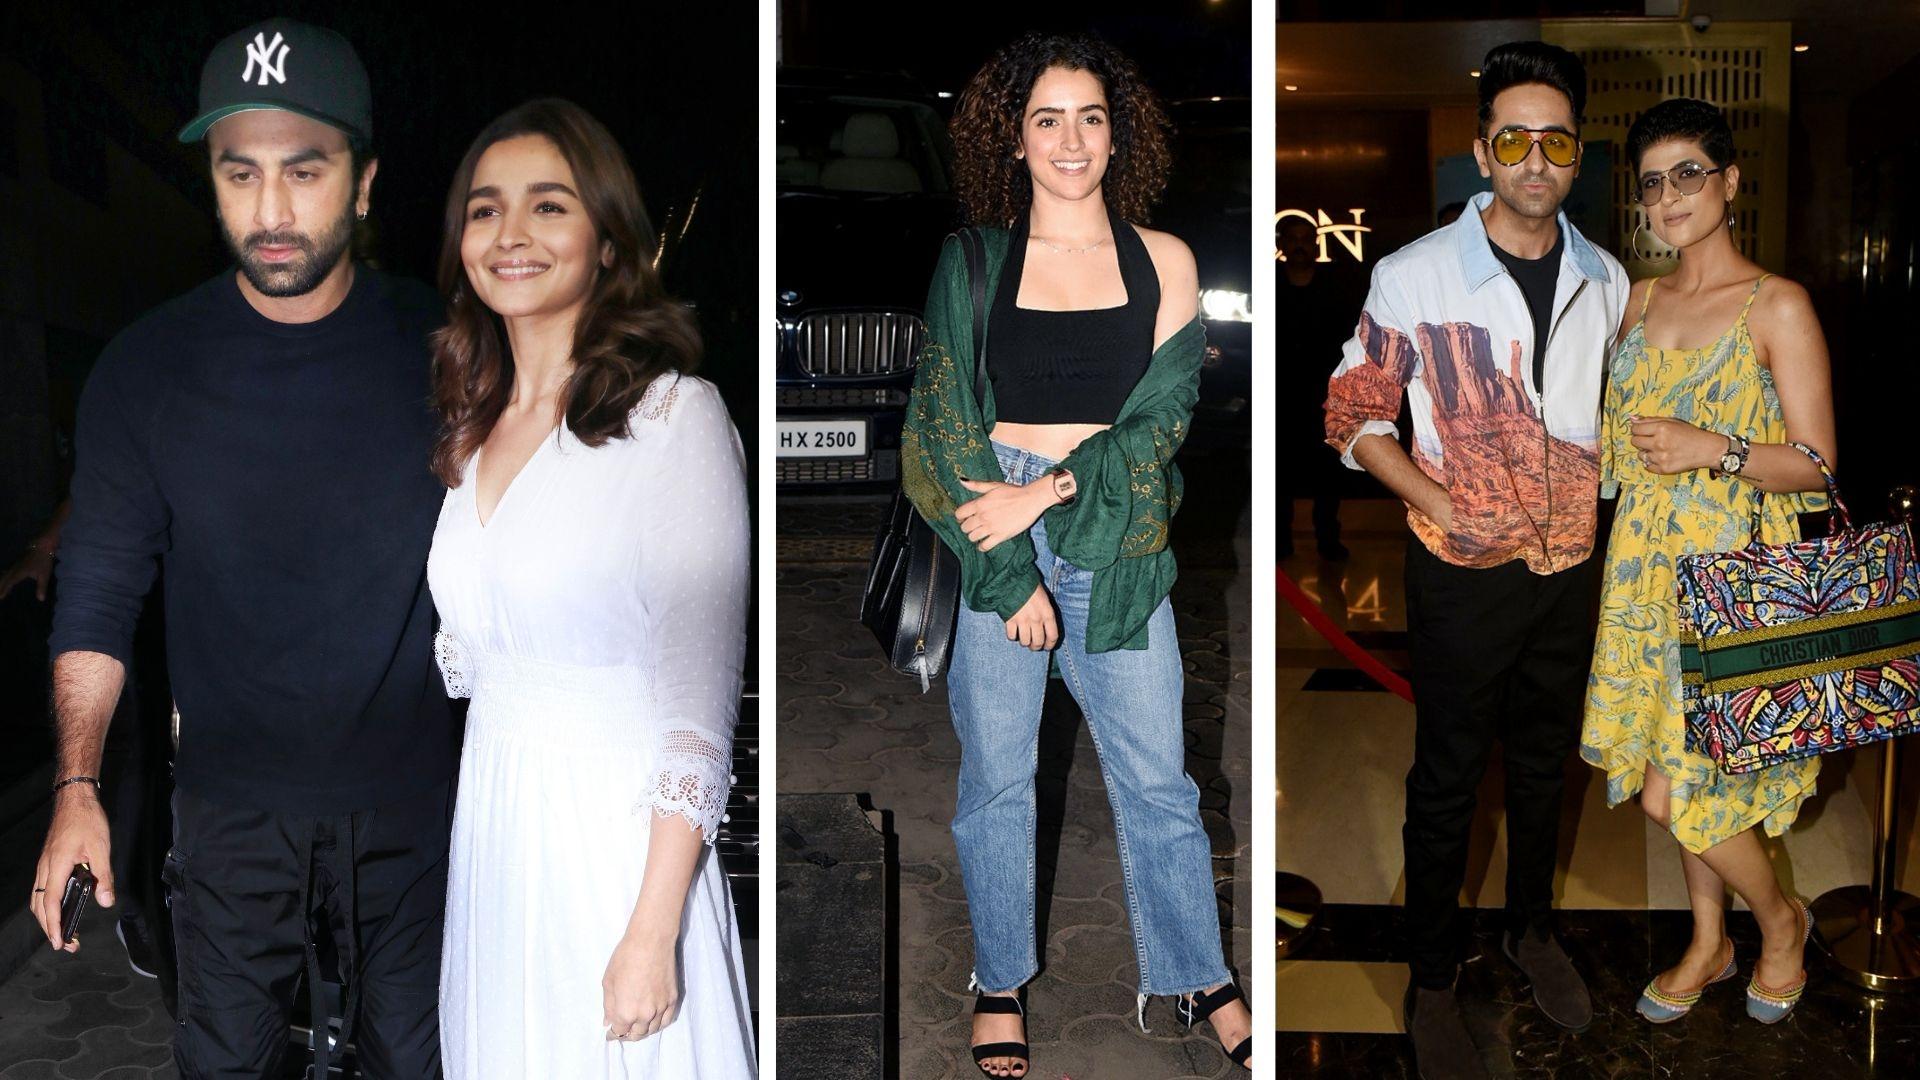 In Pics: Ranbir, Alia, Ayushmann Attend 'De De Pyaar De' Screening